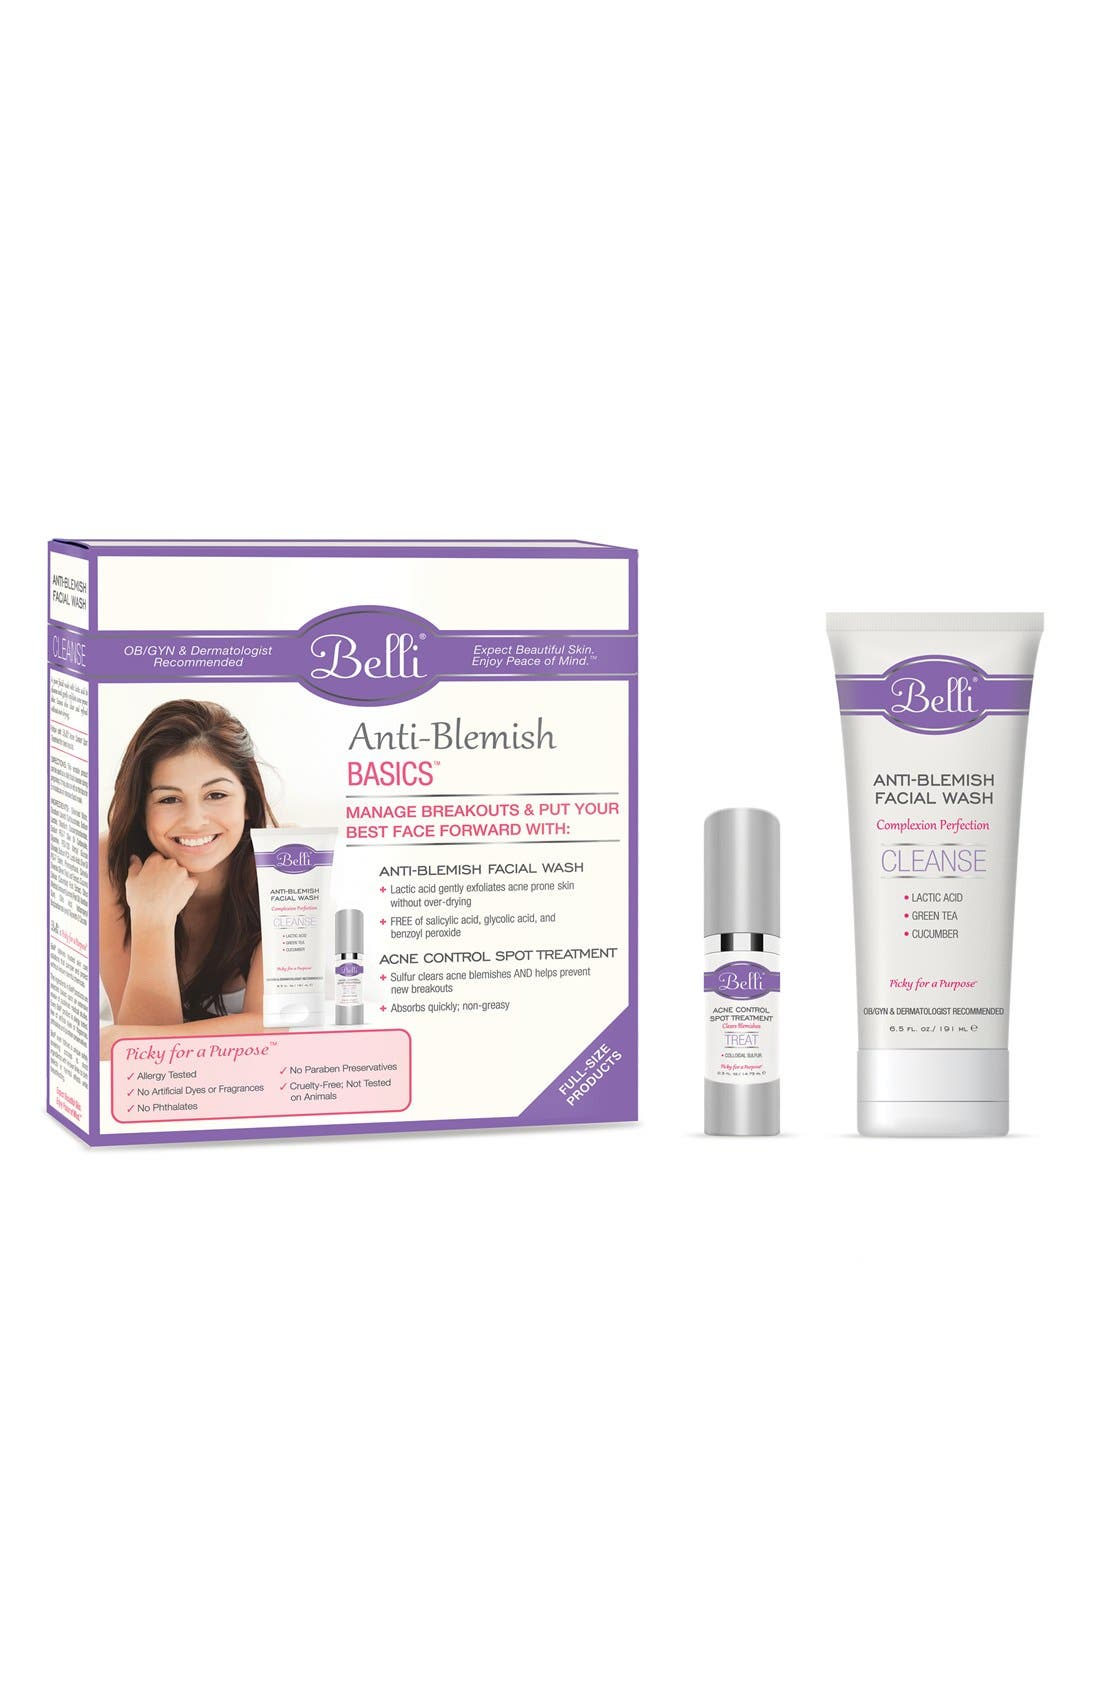 Belli Skincare Maternity Anti-Blemish Basics with Anti-Blemish Facial Wash (6.5 oz.) & Acne Control Spot Treatment (1.5 oz.)